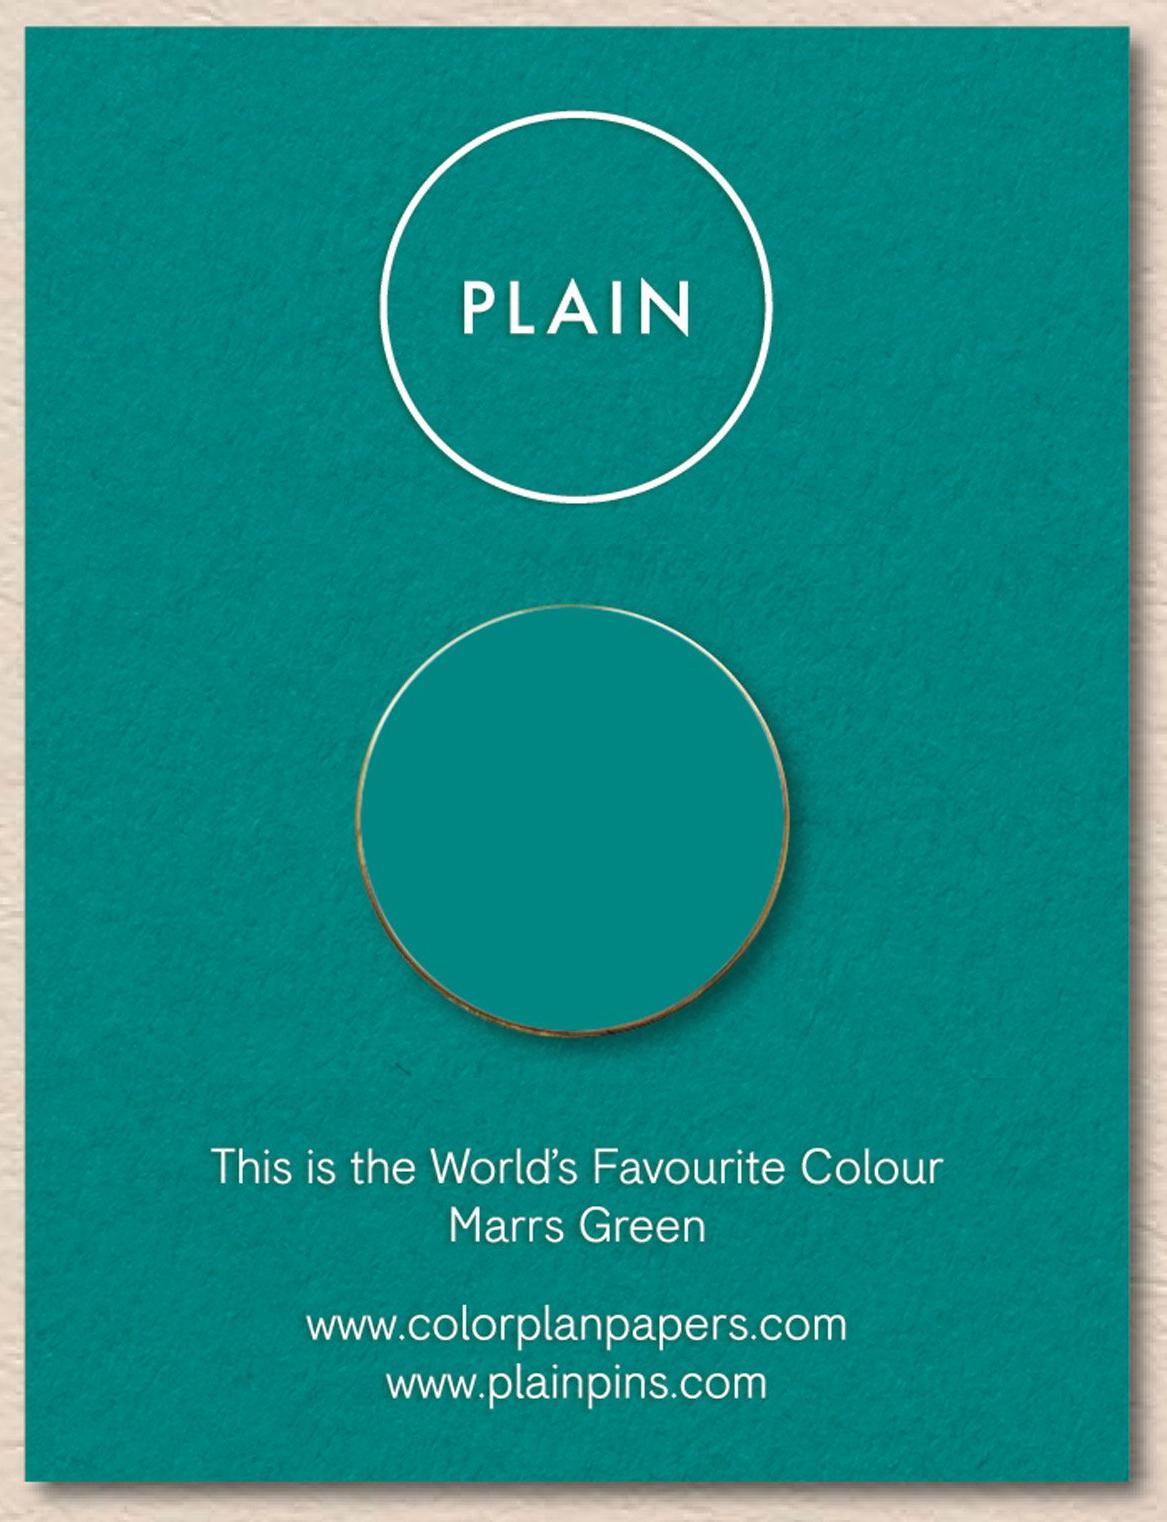 most-popular-color-02